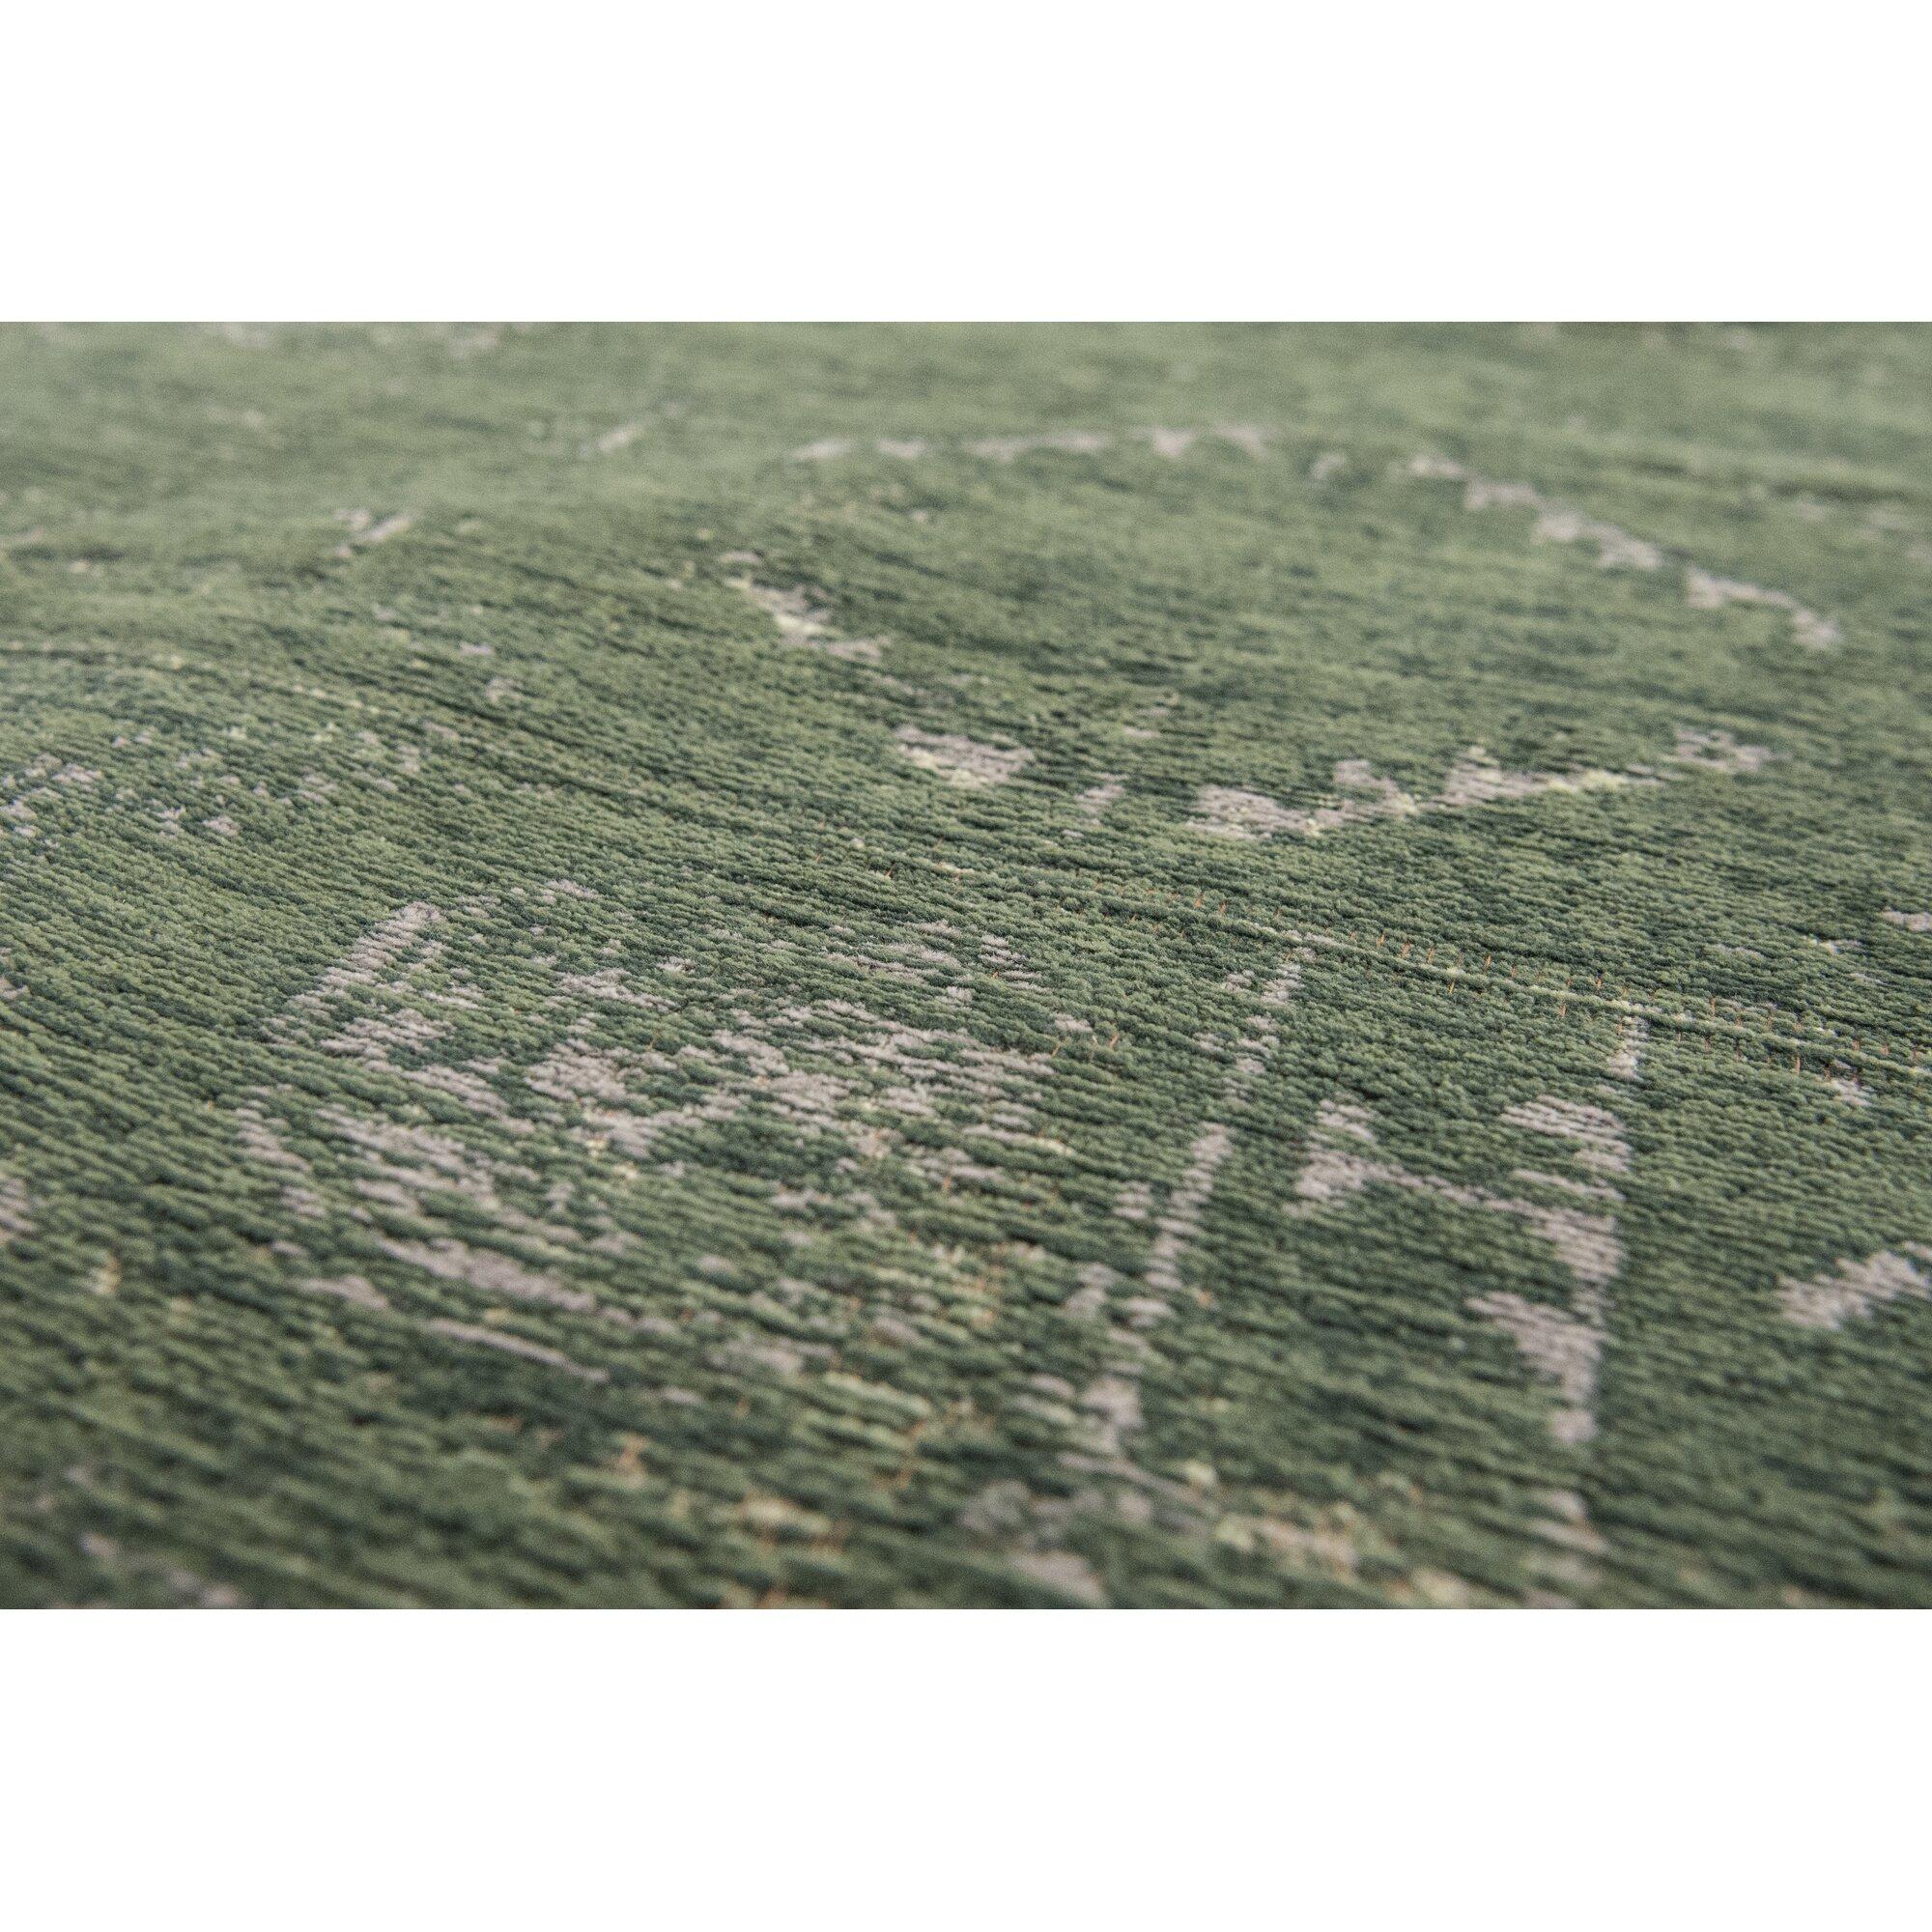 Caracella Teppich Fading World in DunkelgrünGrau  Wayfairde